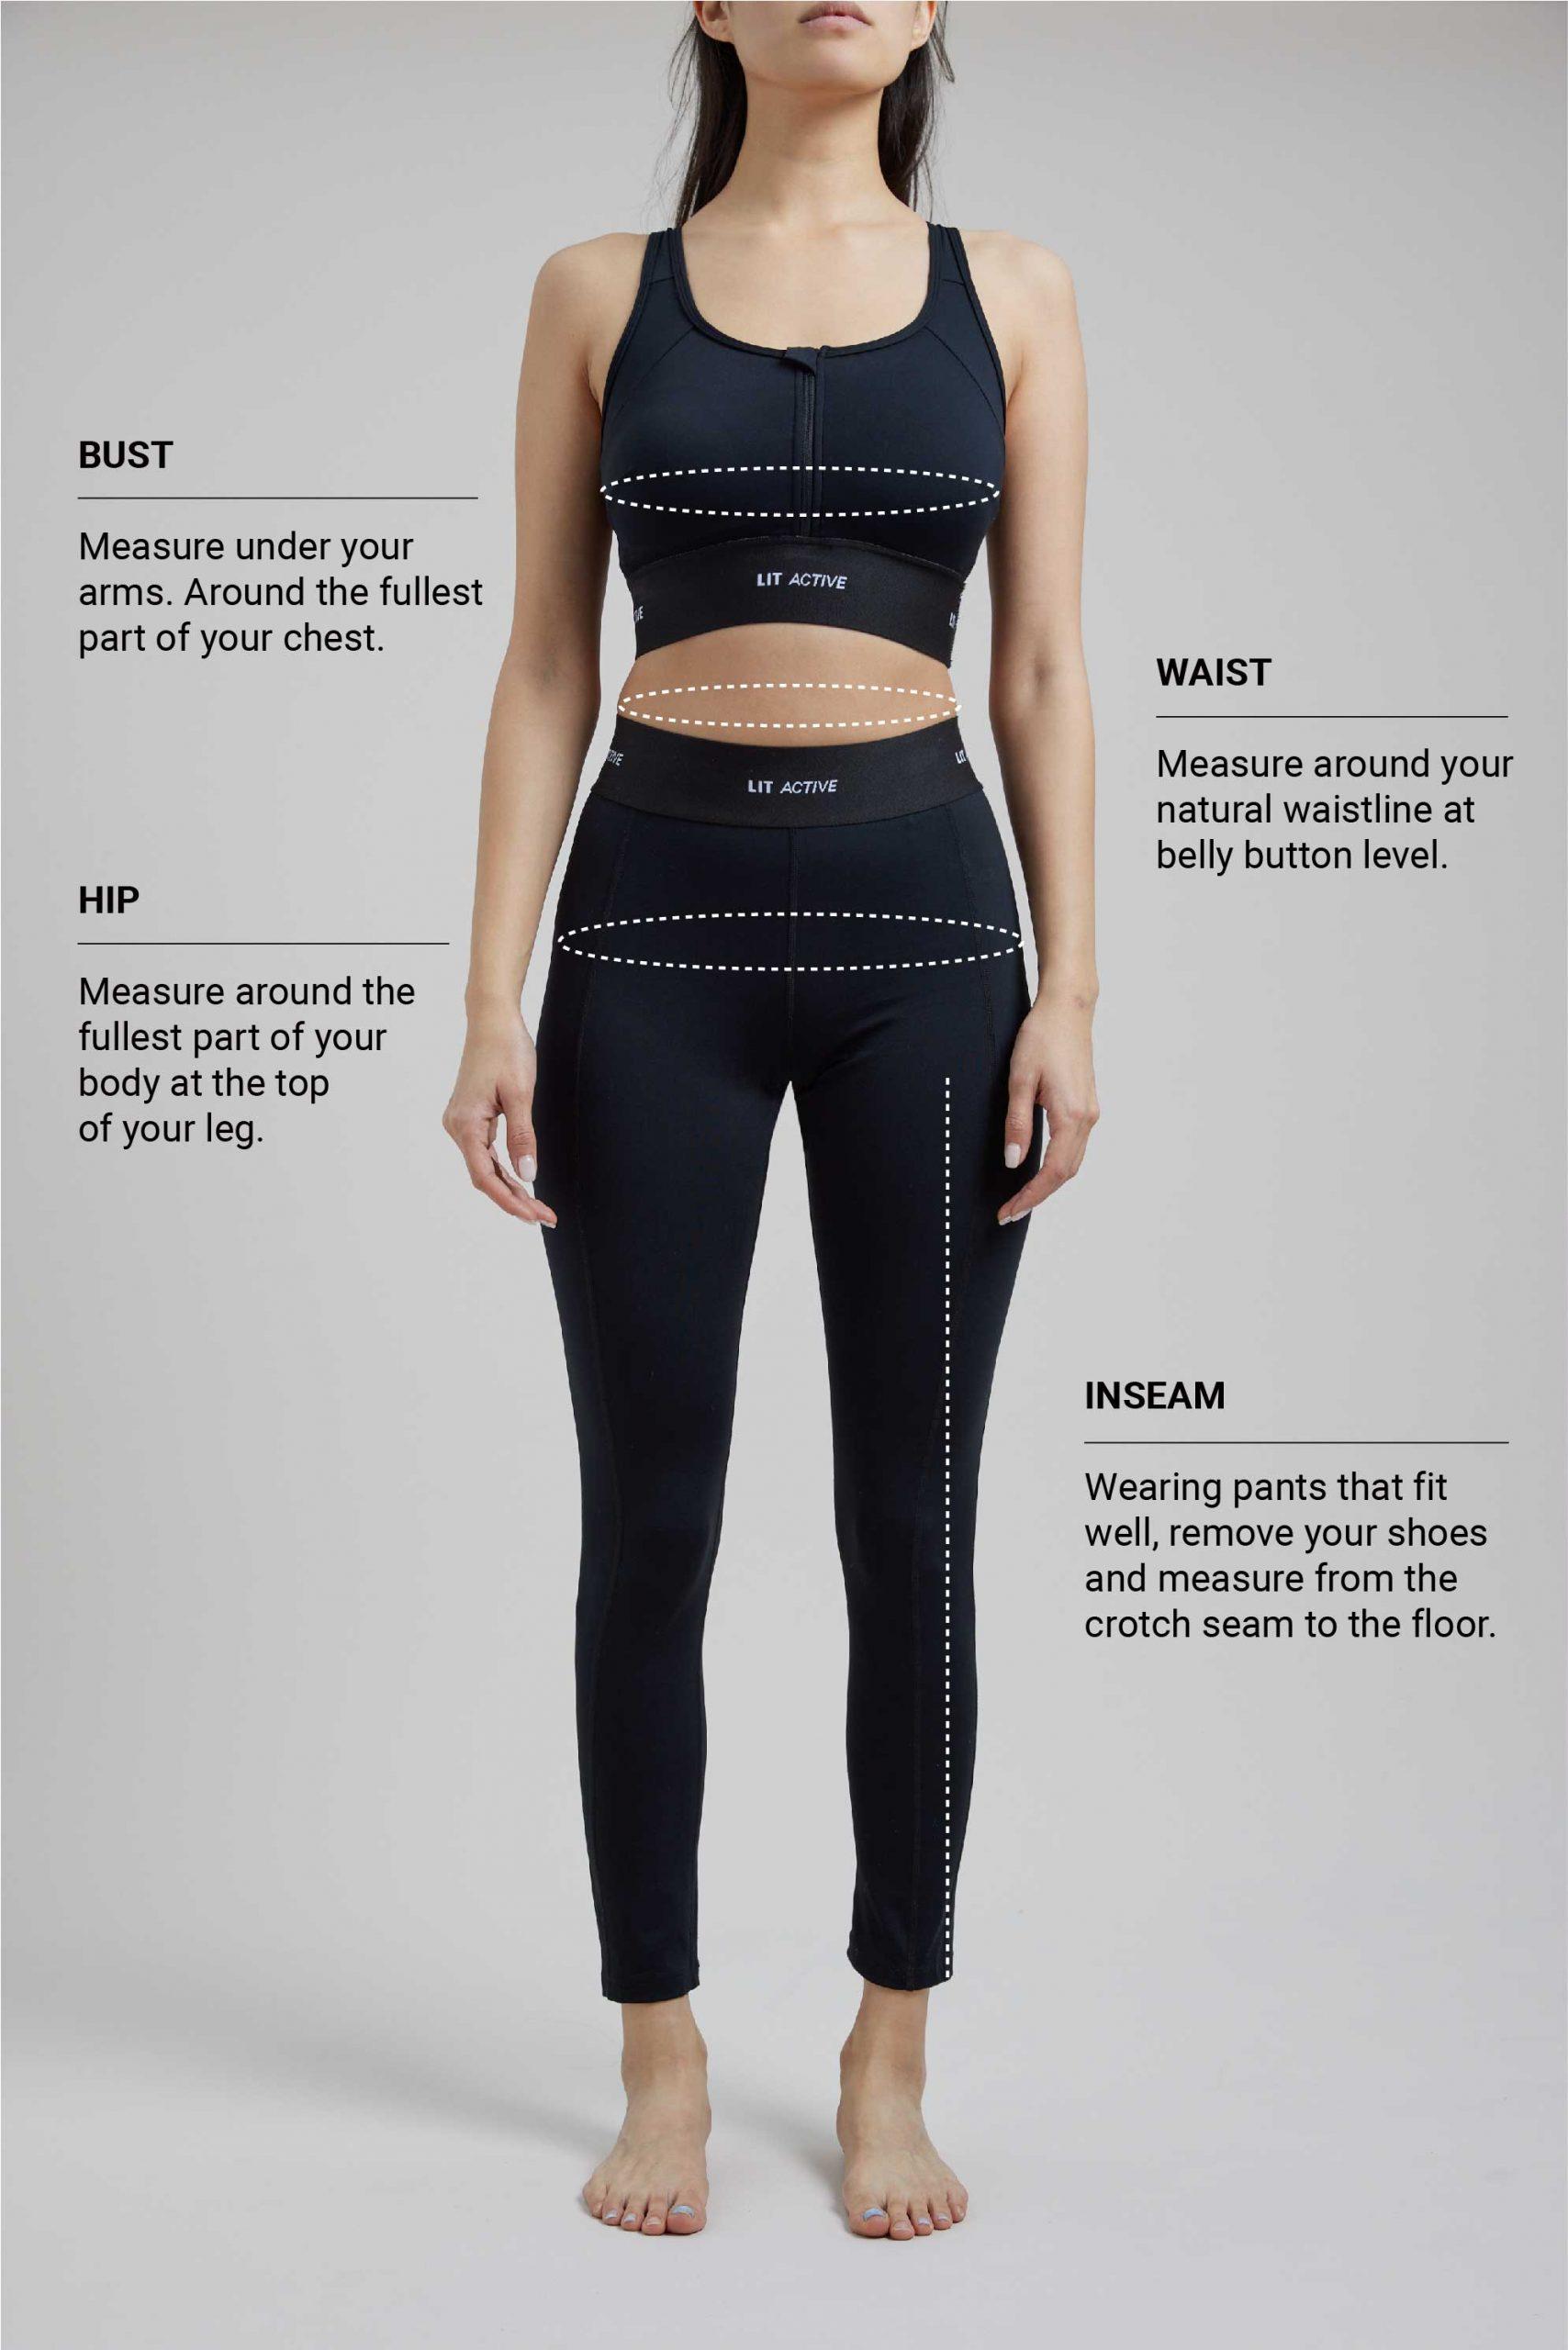 Women's Yoga Size Chart